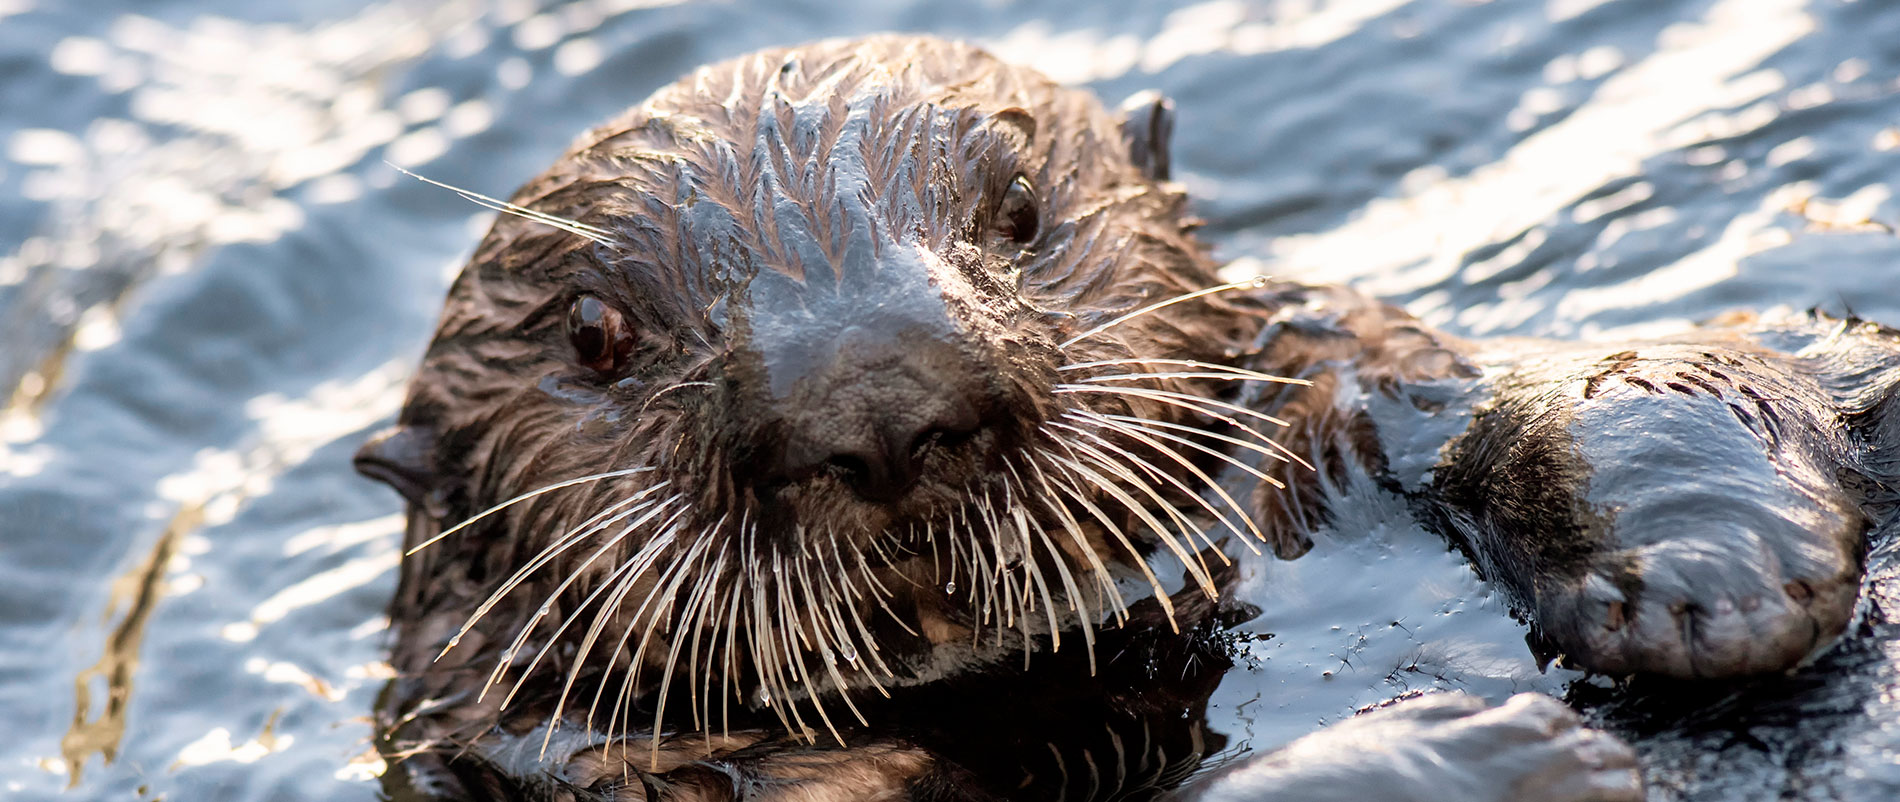 Northern Sea Otters at SeaWorld San Diego